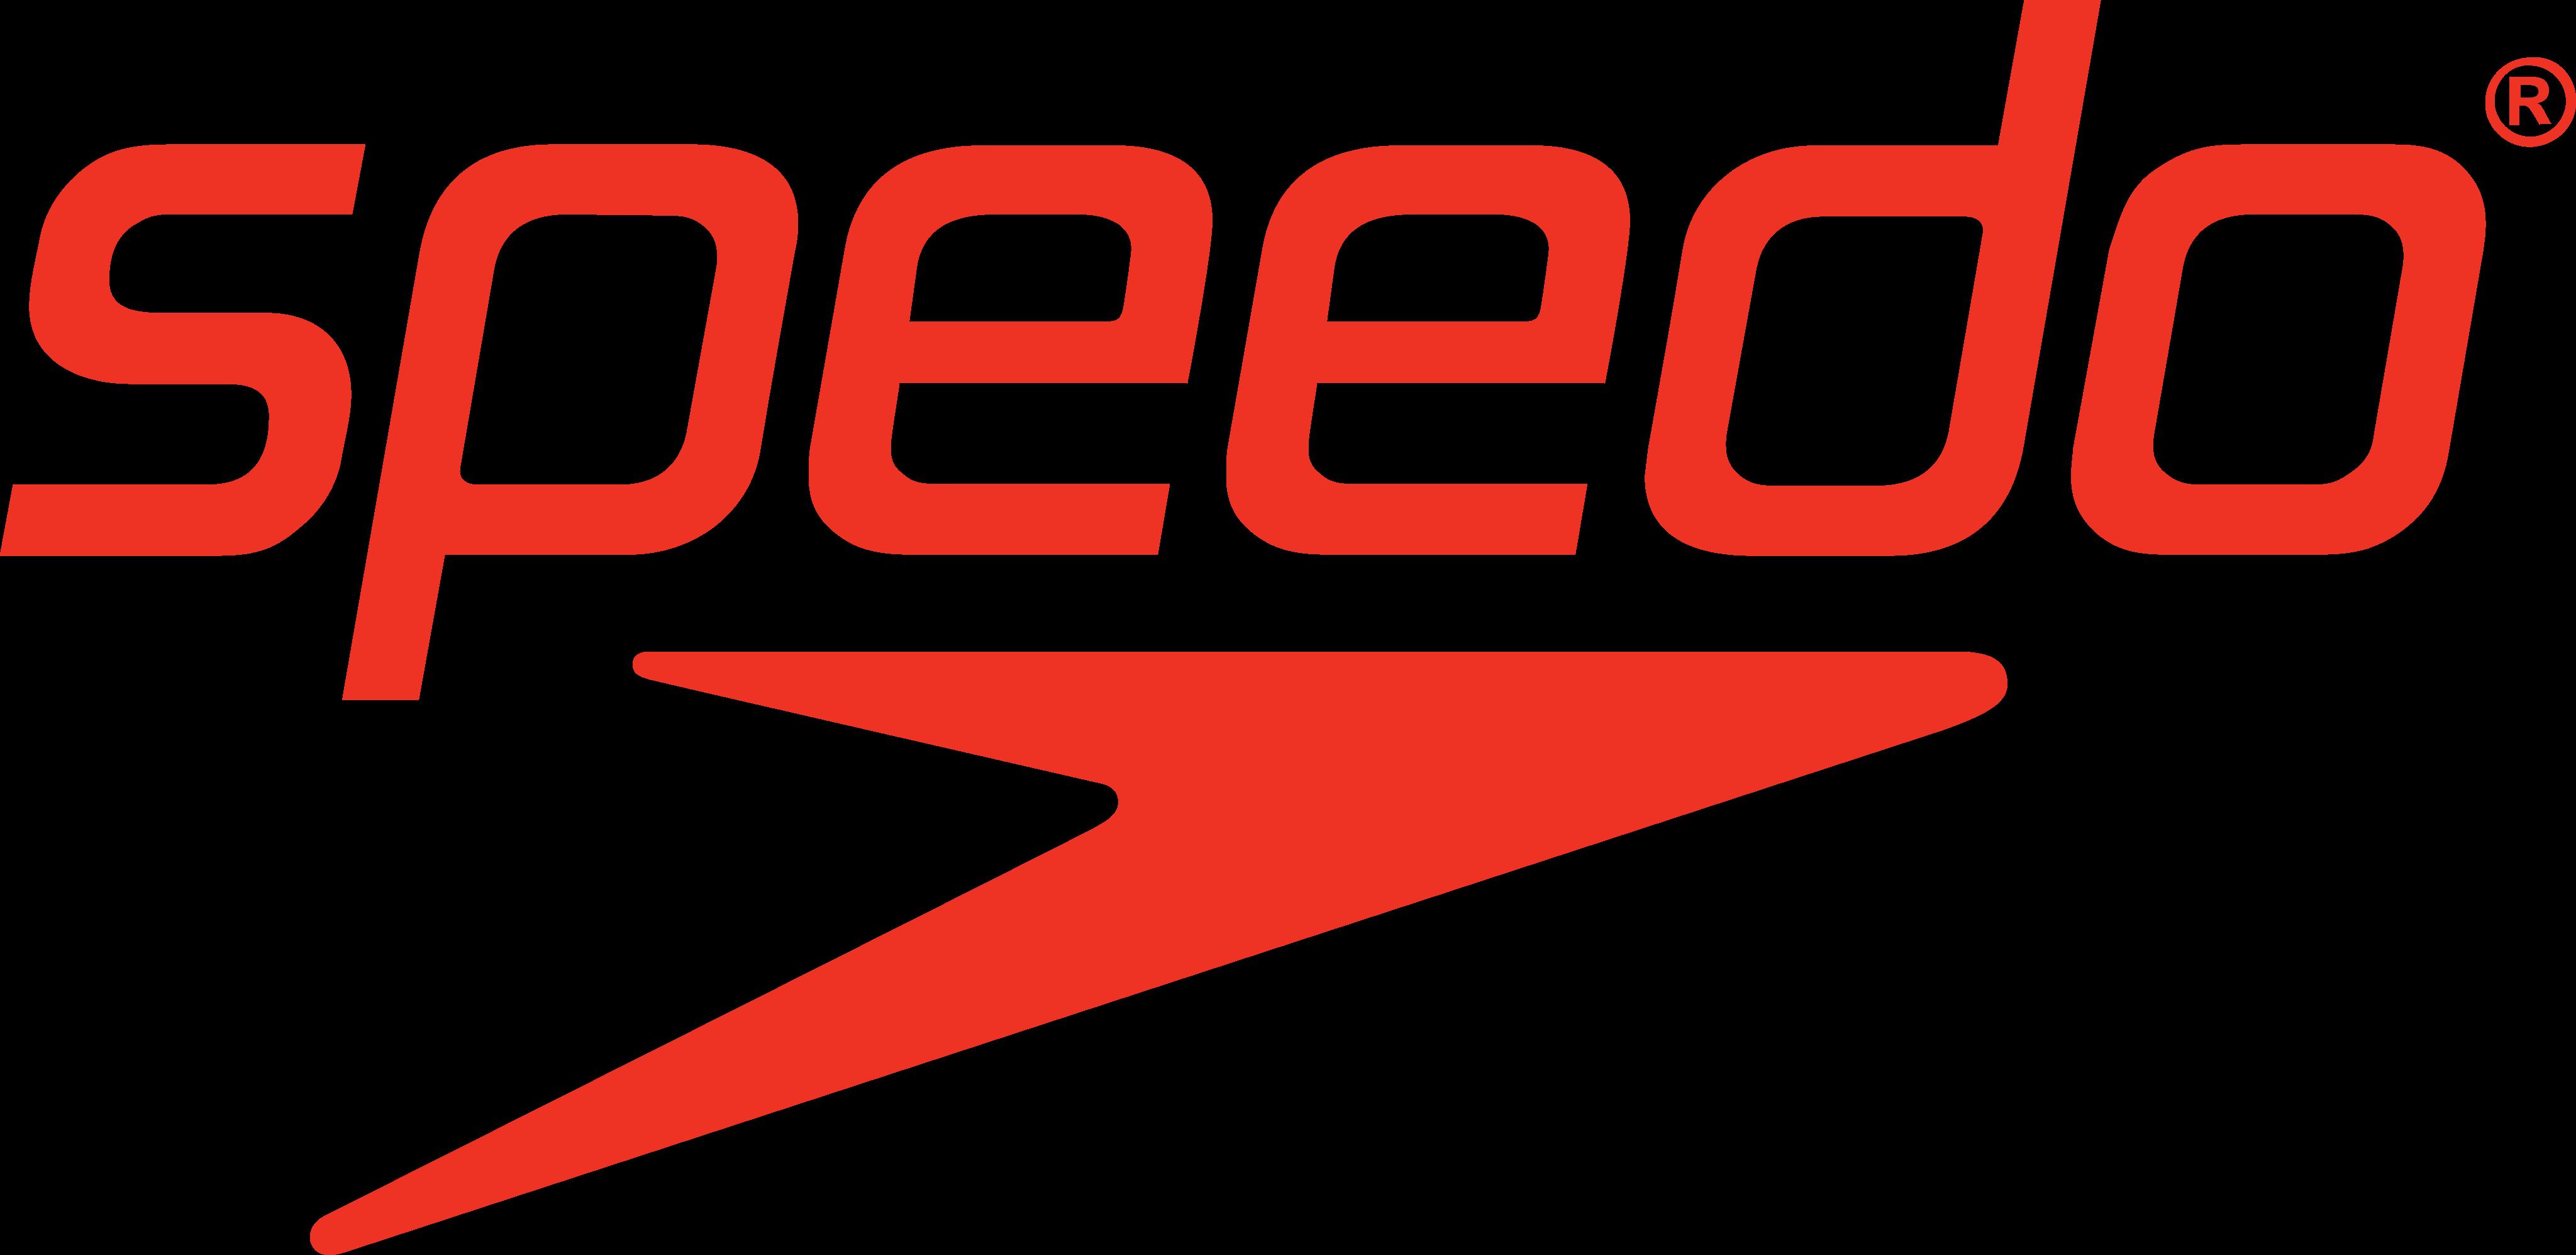 speedo logo 1 1 - Speedo Logo